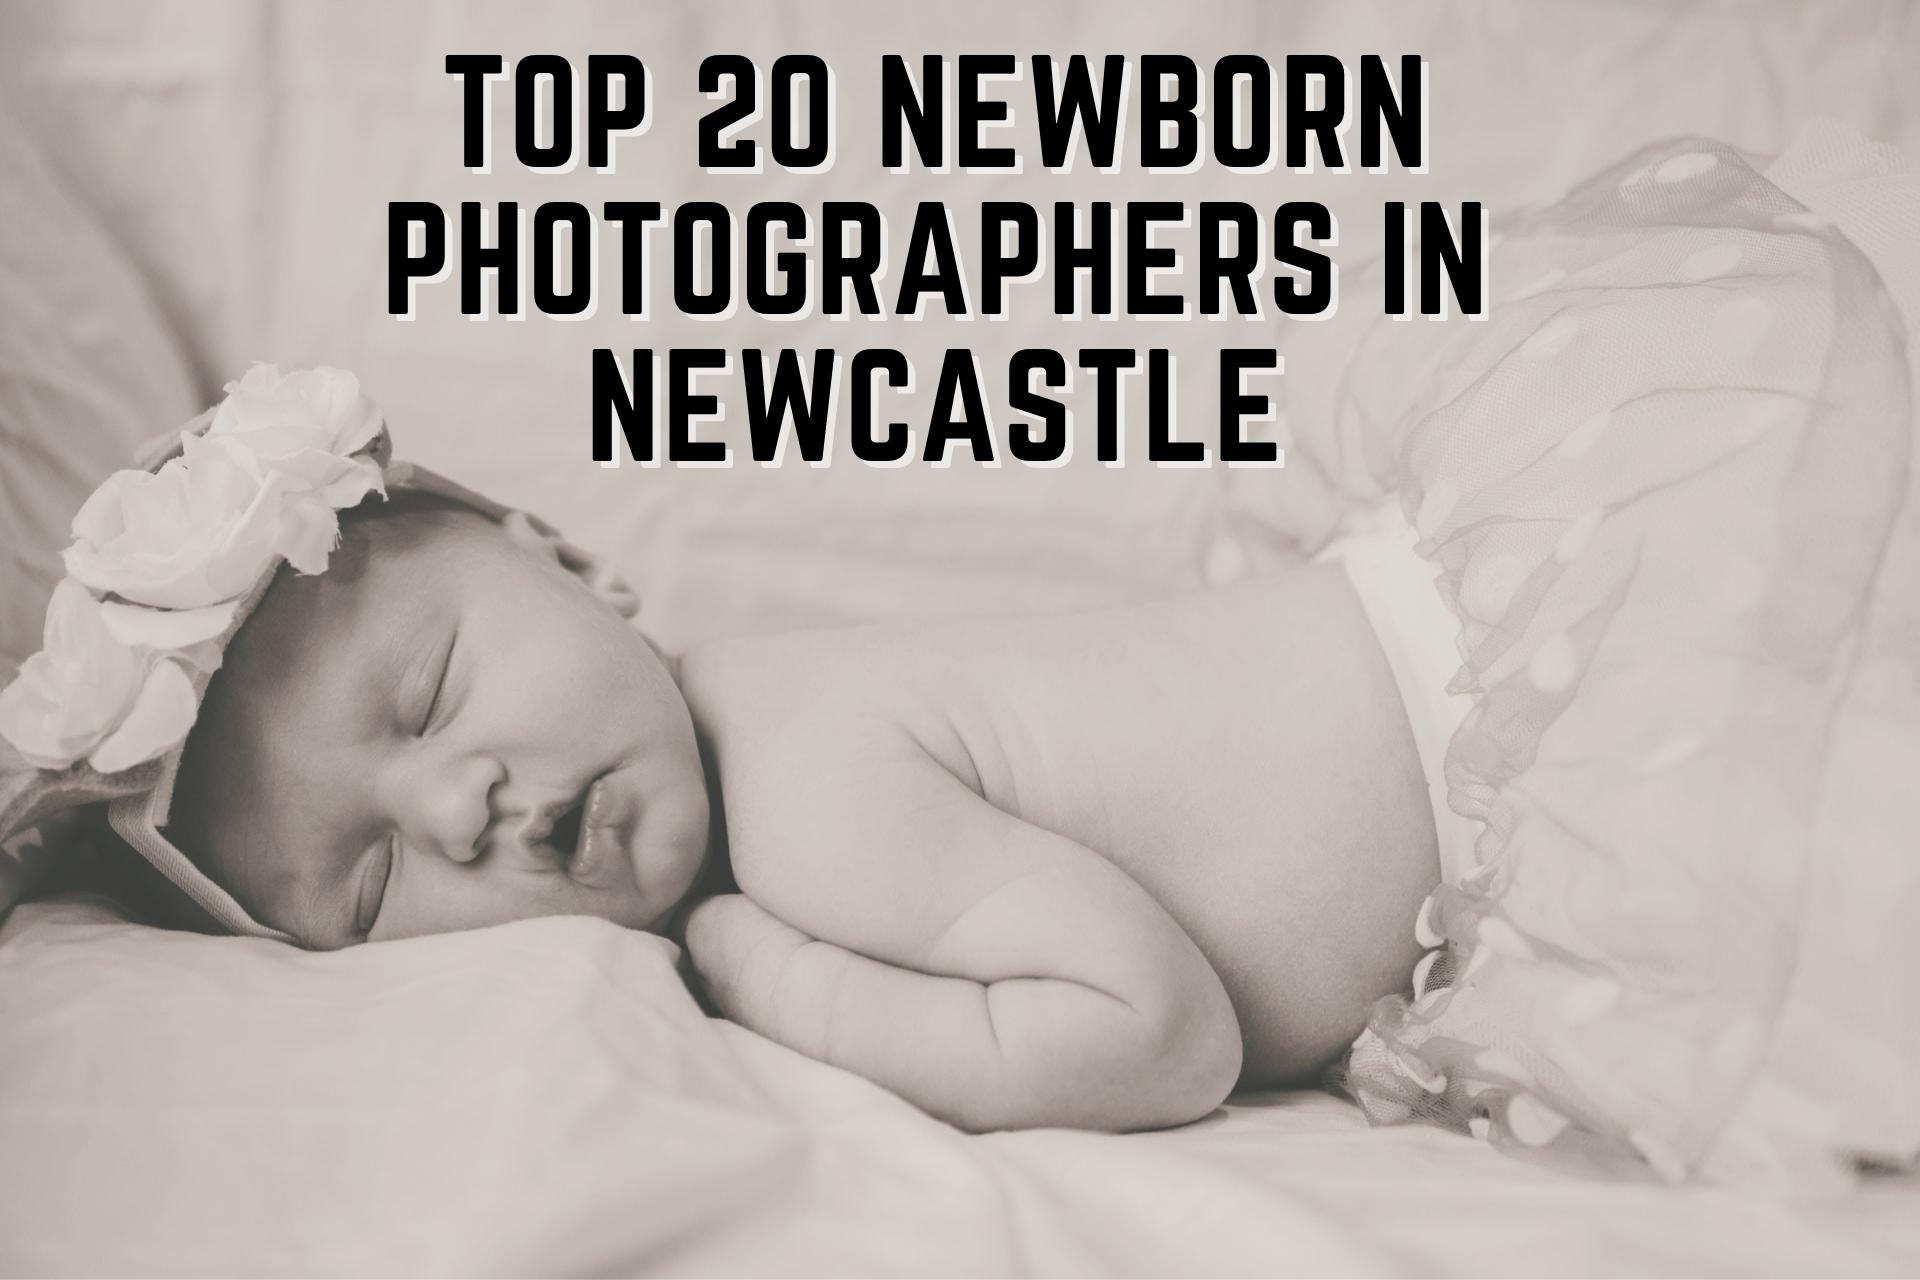 TOP 2o NEWBORN PHOTOGRSPHERS in NEWCASTLE